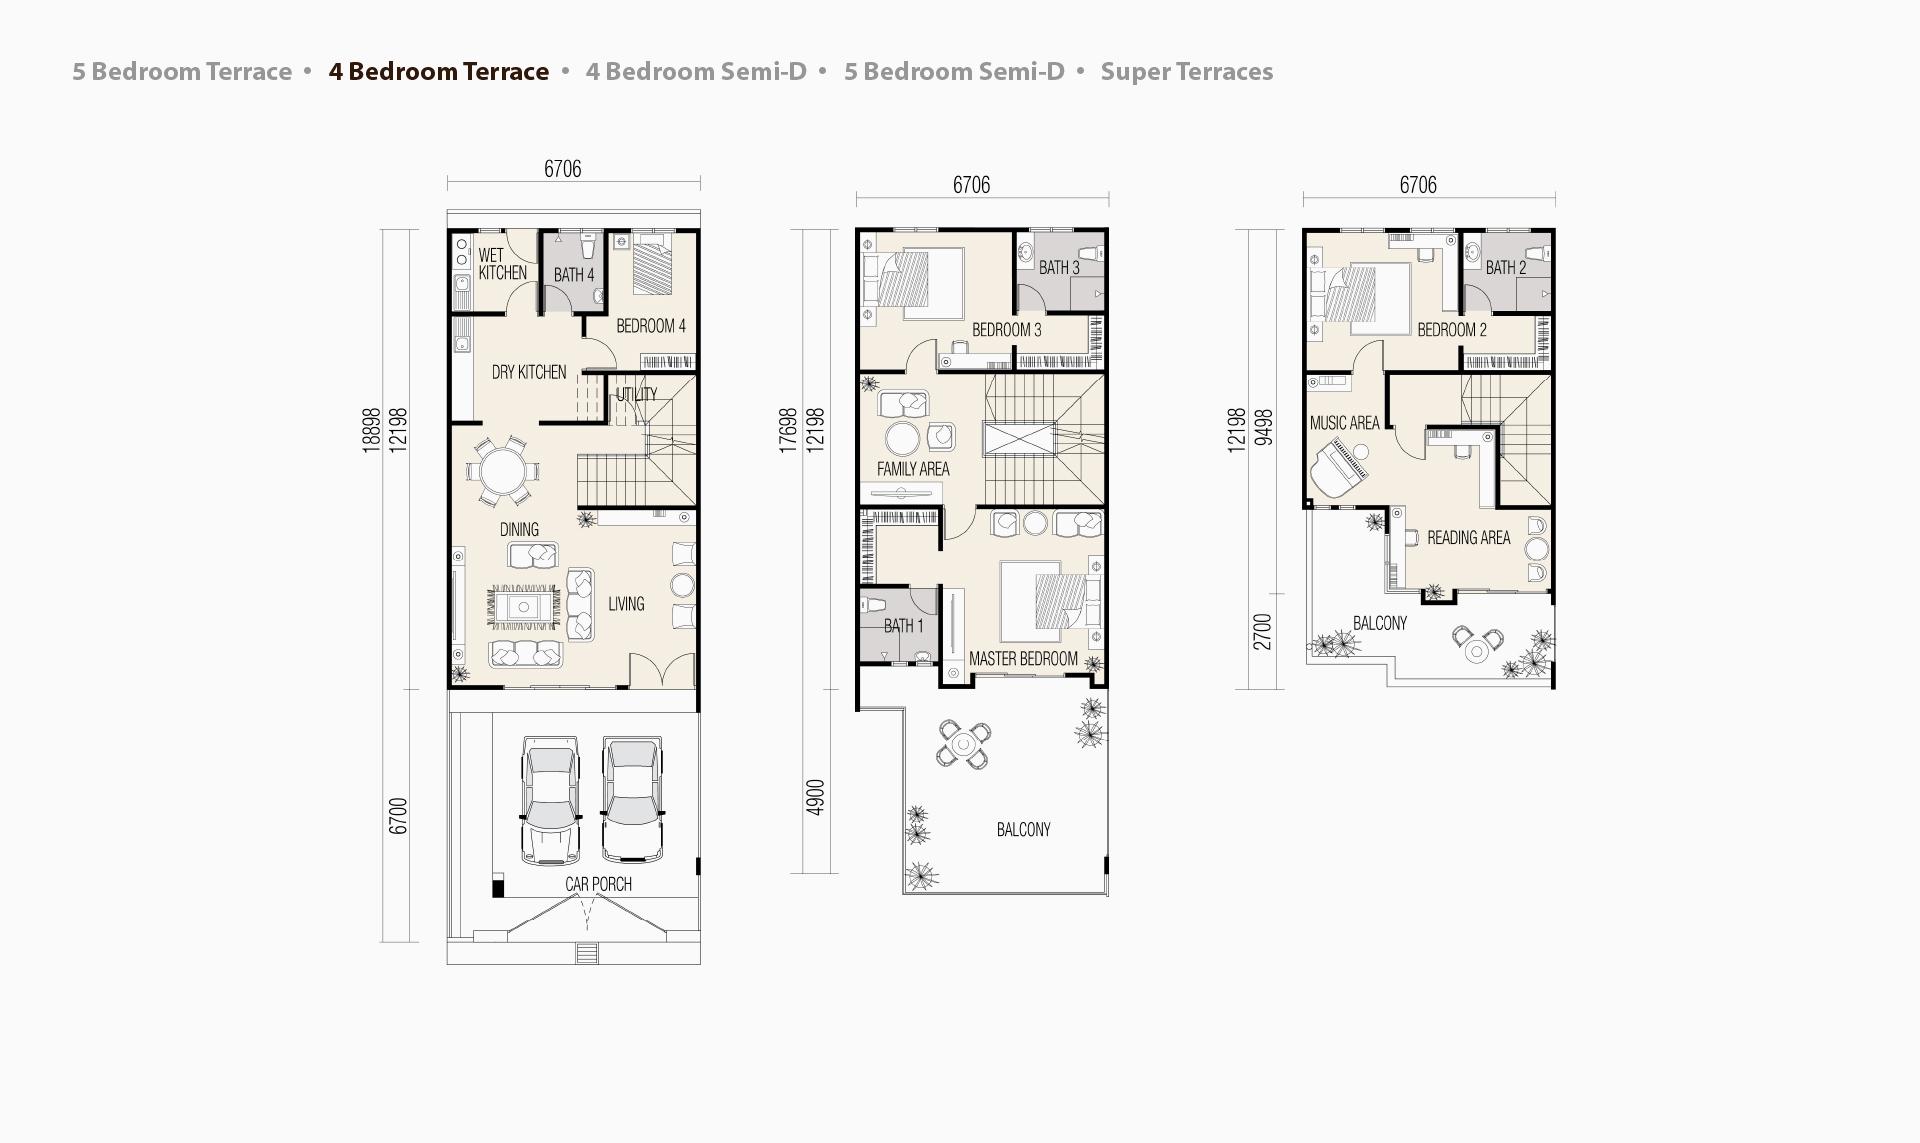 bm_permai_plan_4_bedroom_terrace